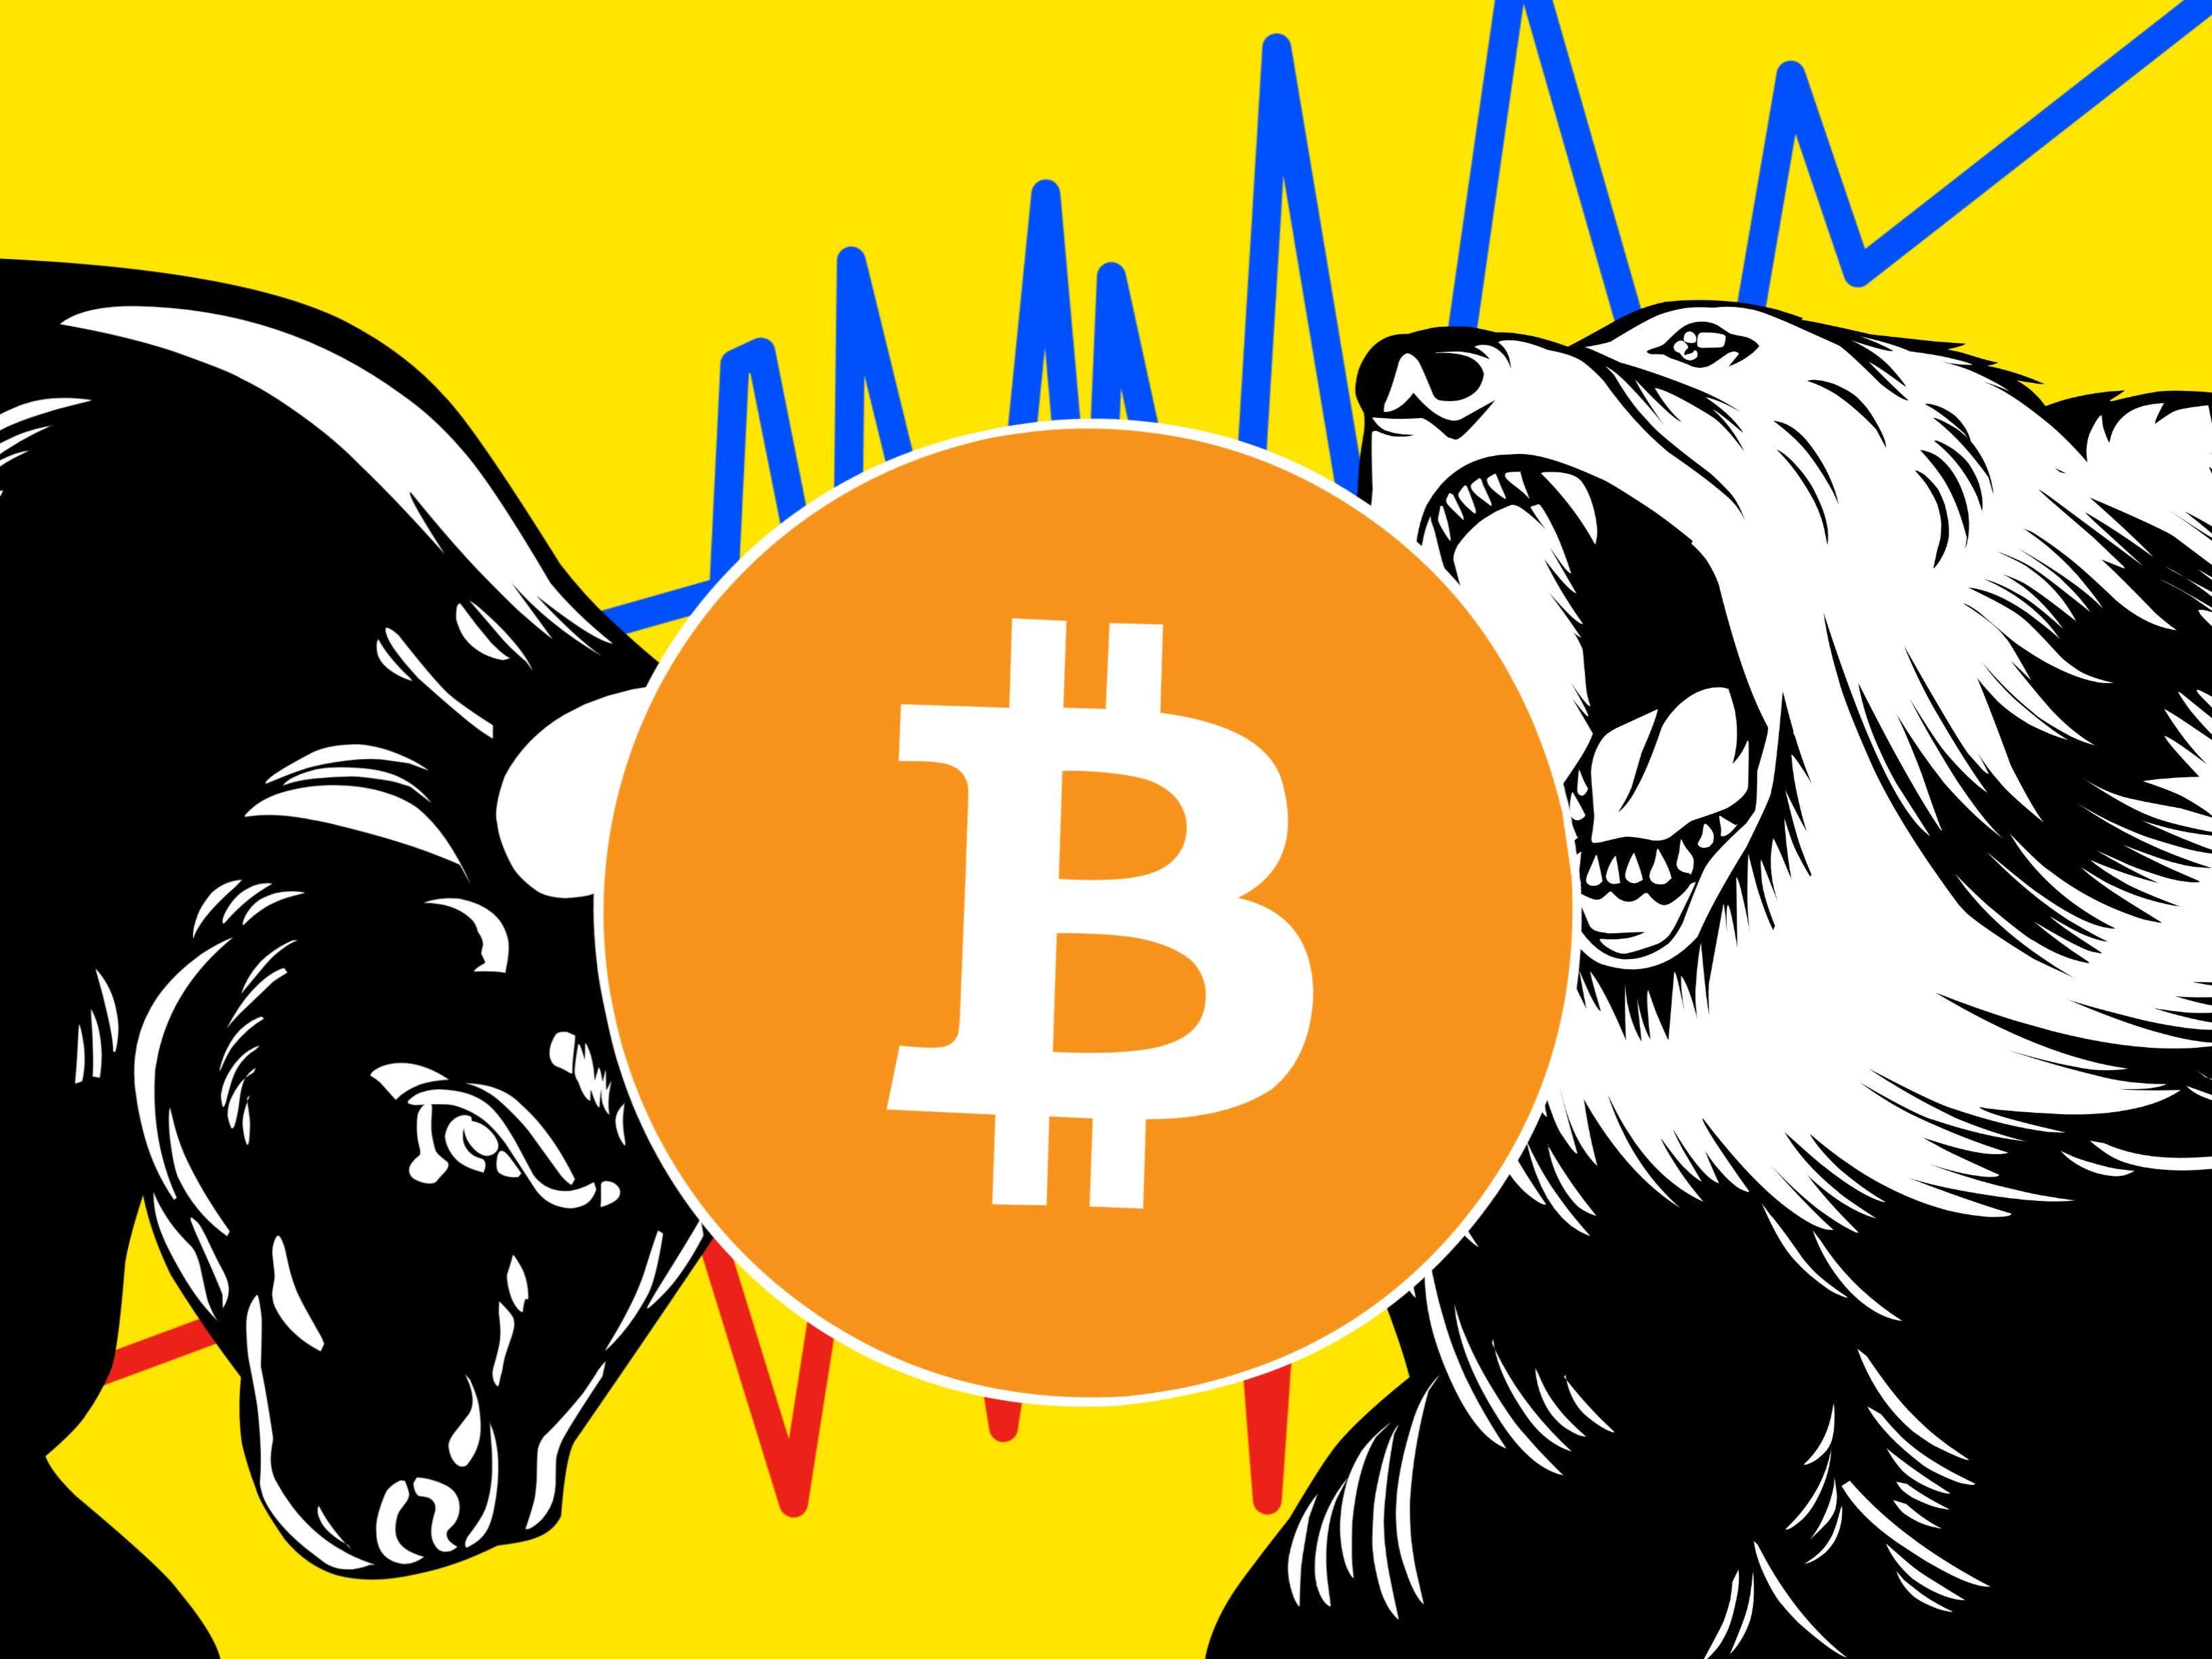 /debunked-3-false-narratives-surrounding-bitcoin-f51y37gv feature image